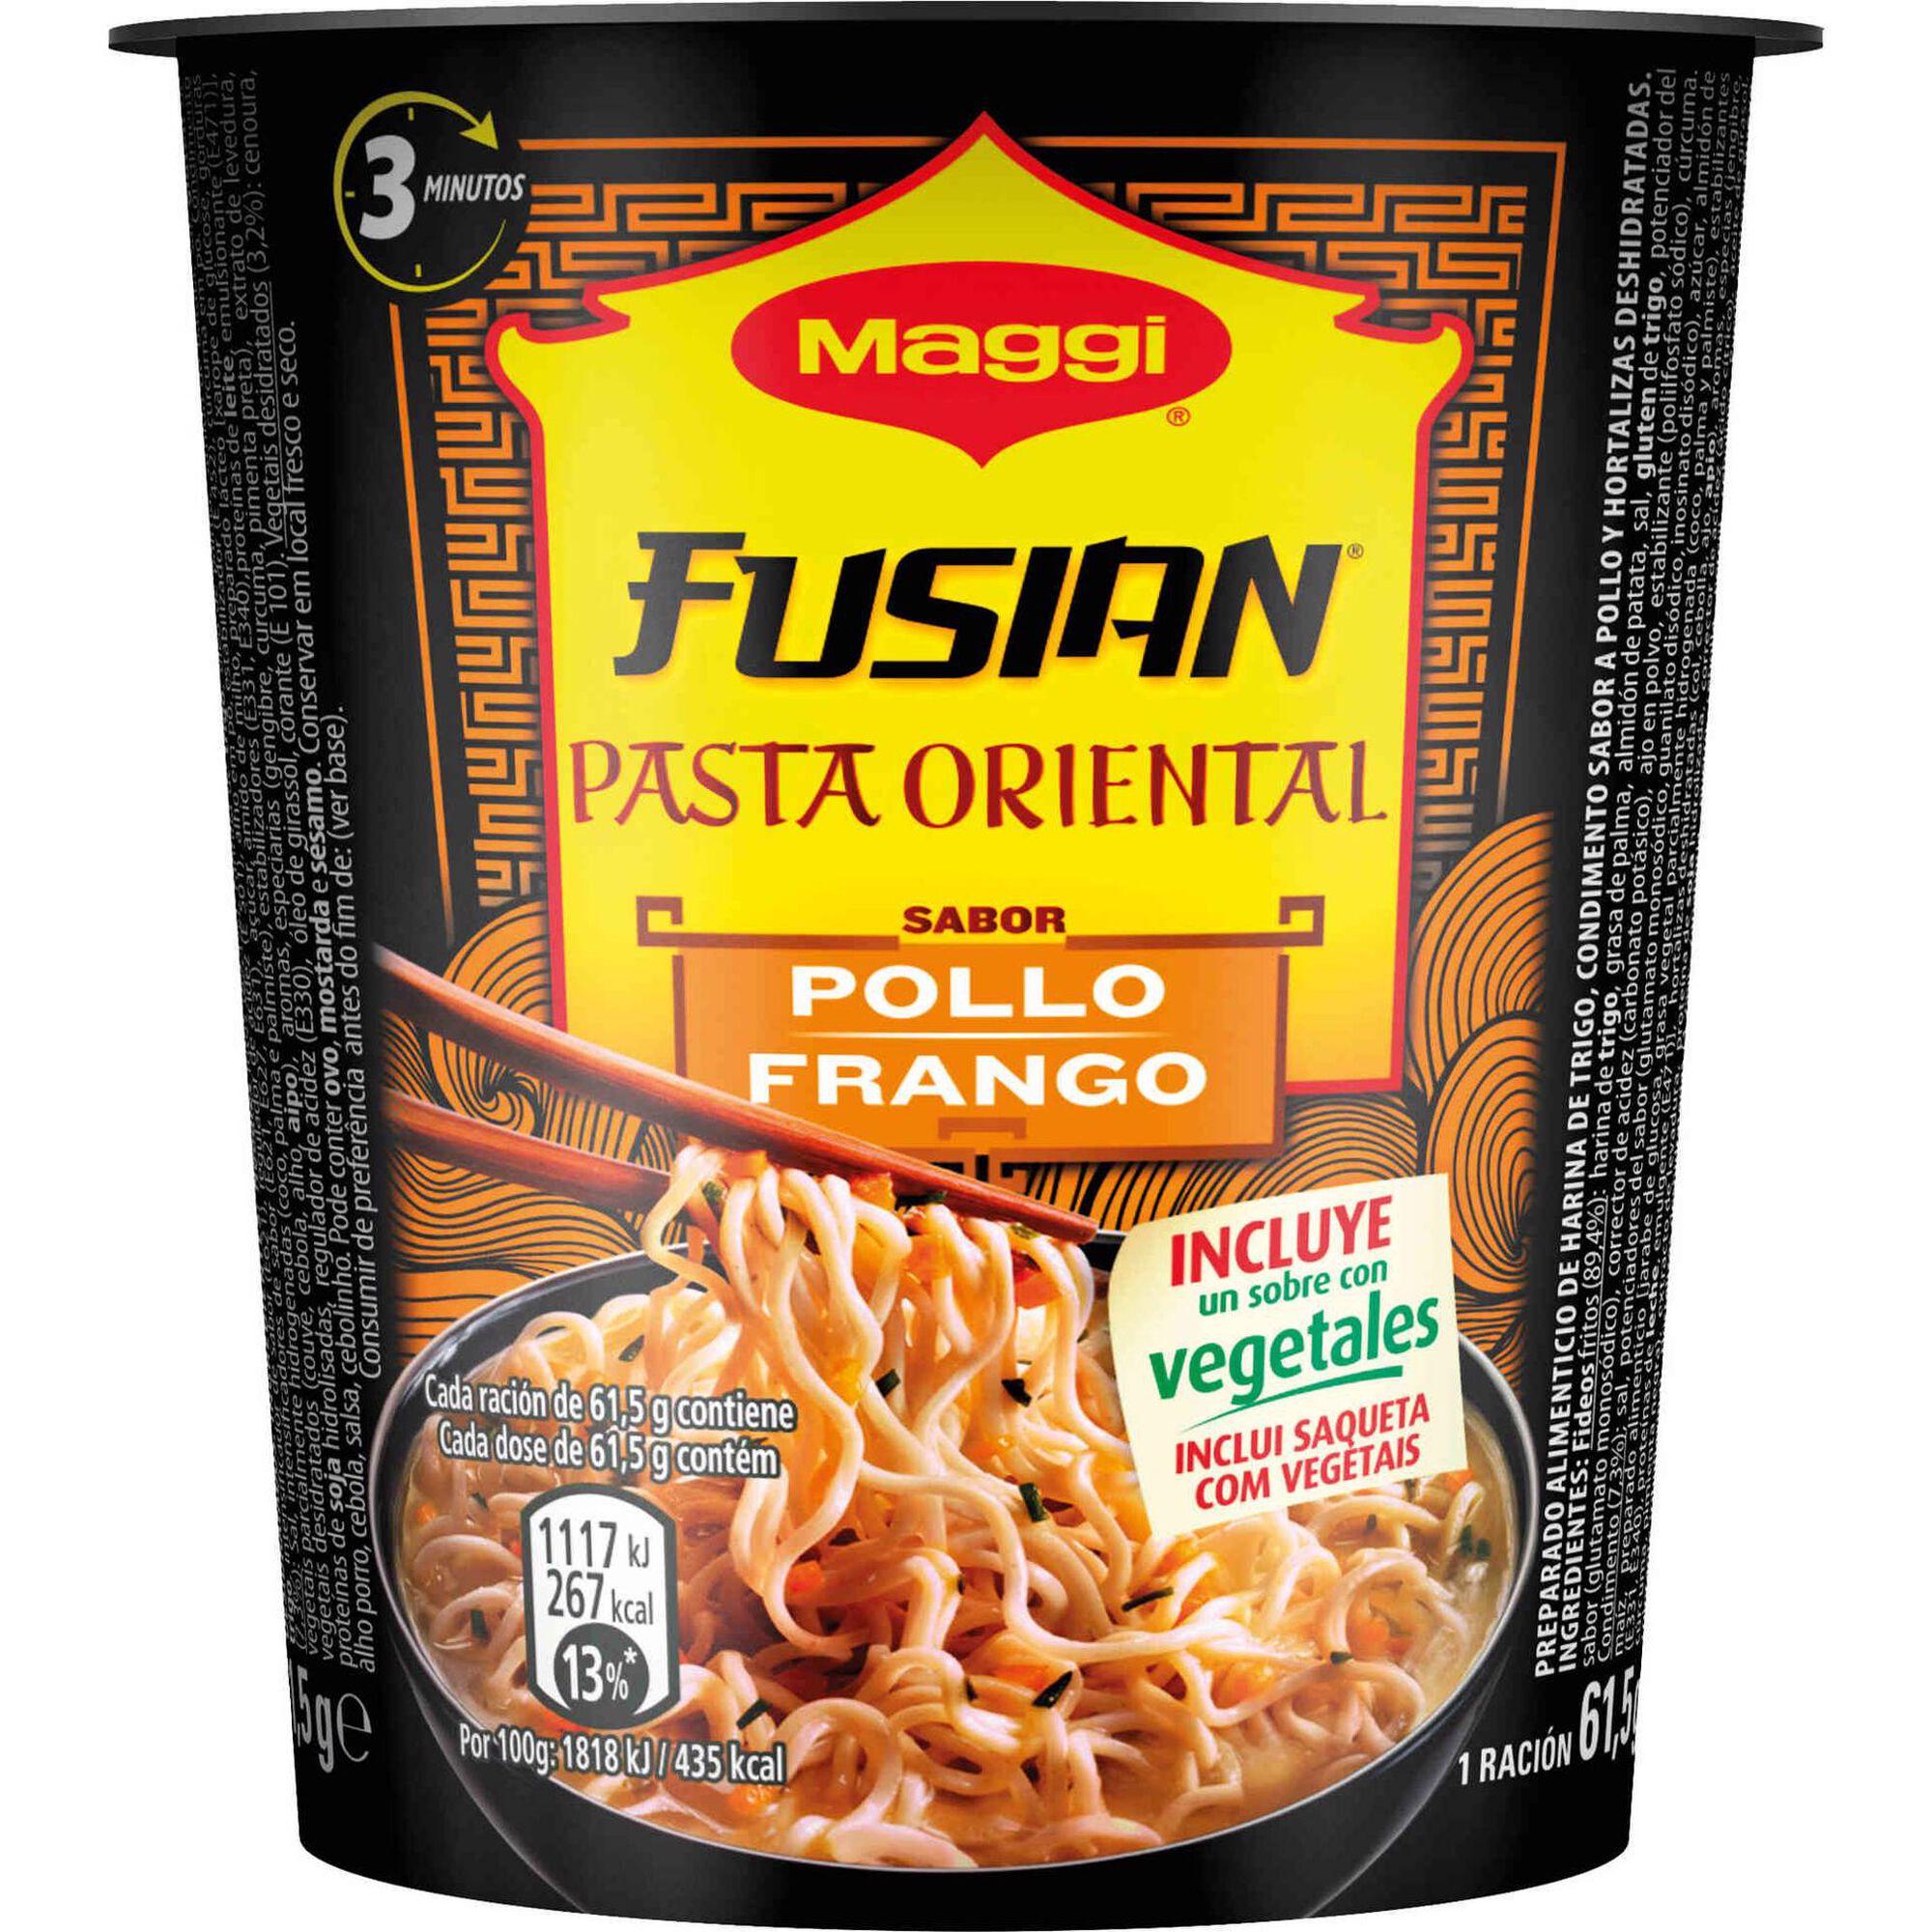 Noodles de Frango Pasta Oriental Cup